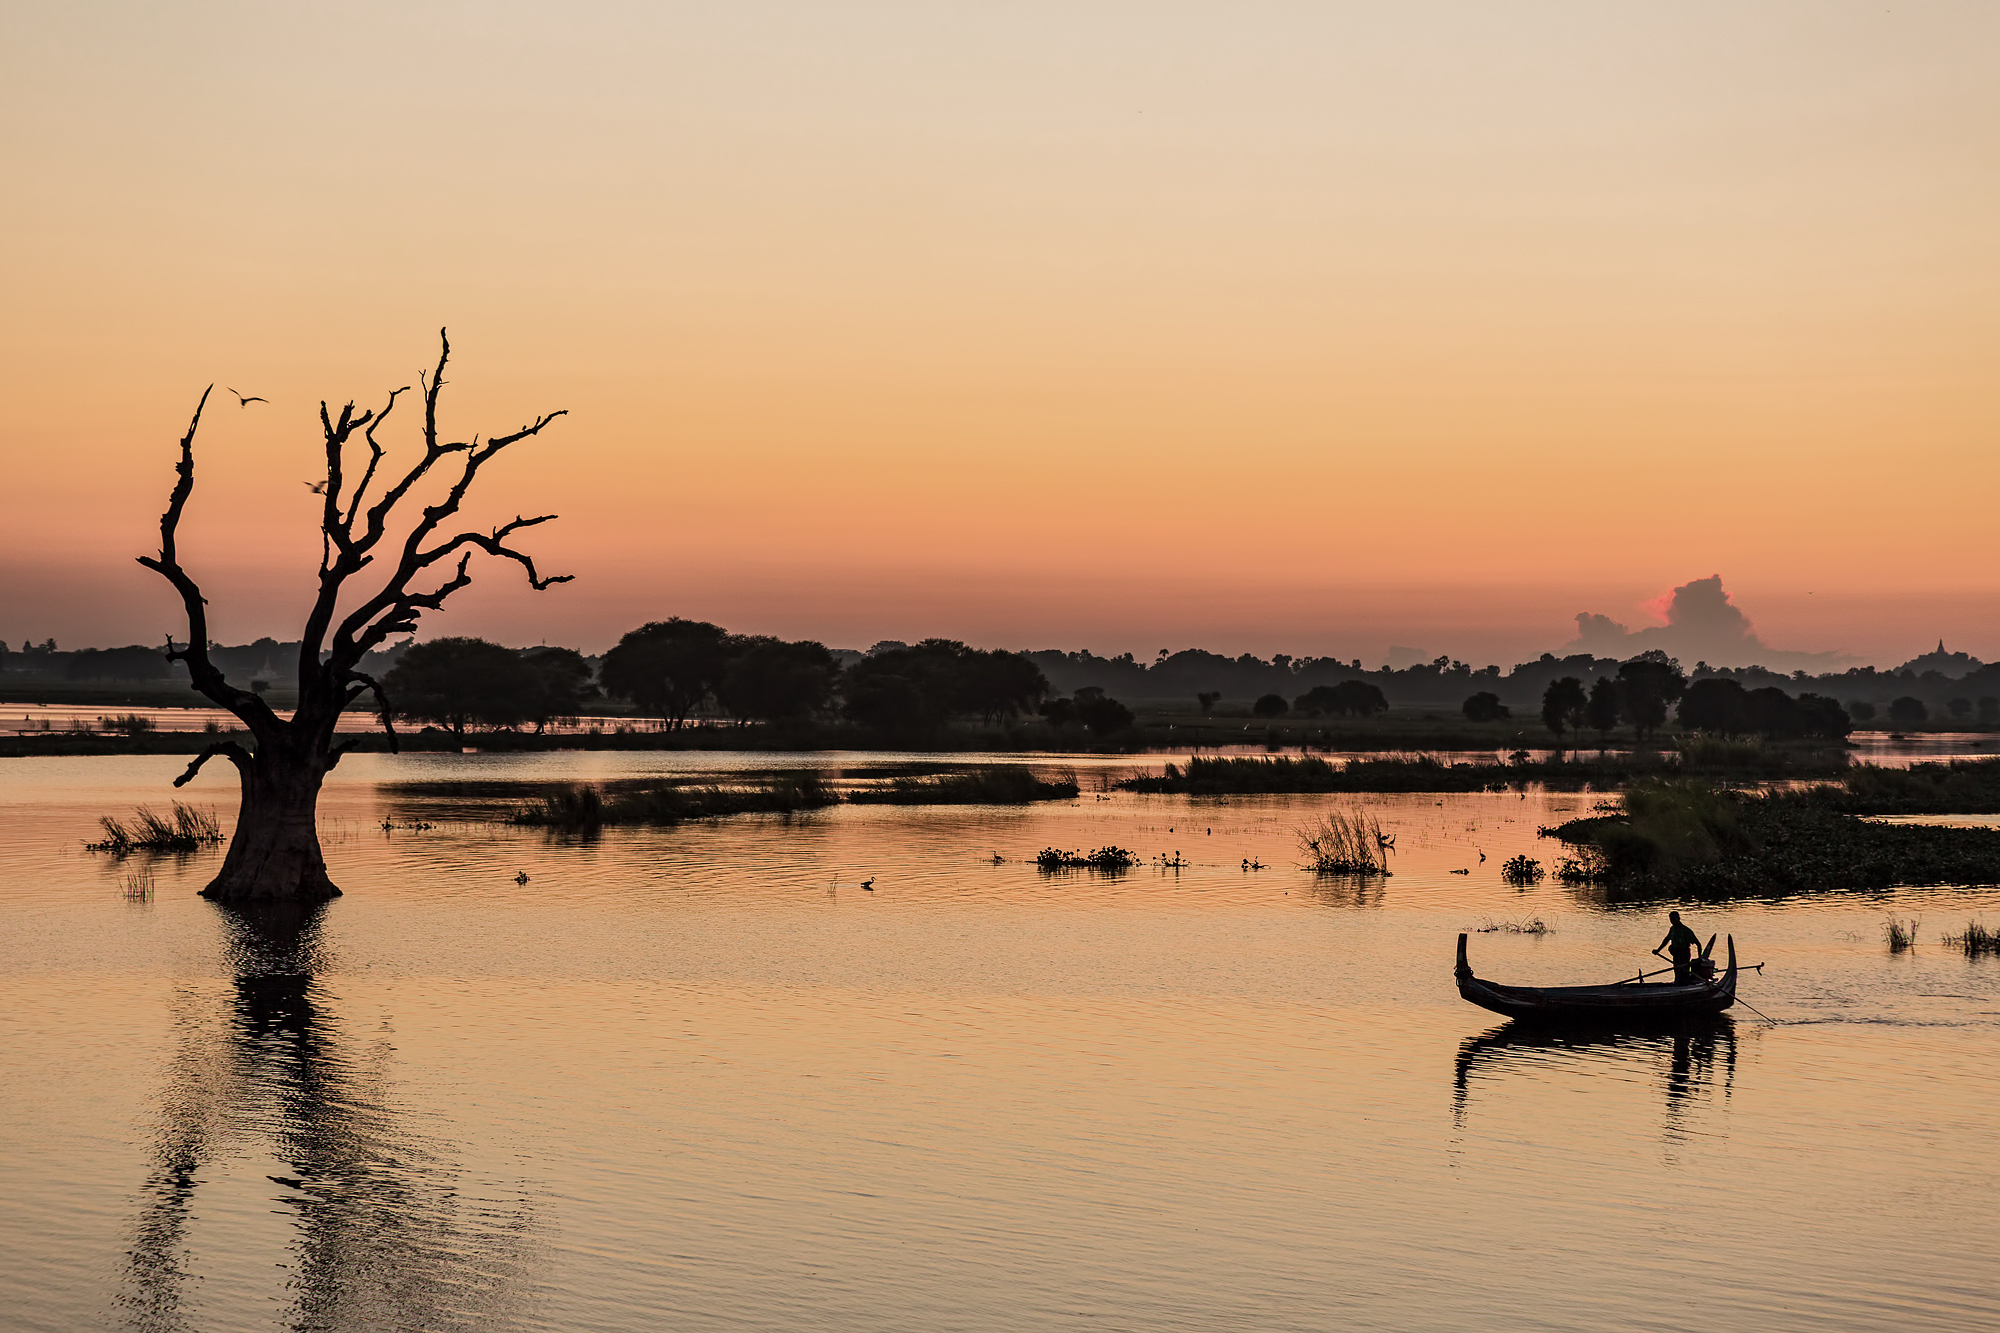 At sunset at the lake in Myanmar, Myanmar